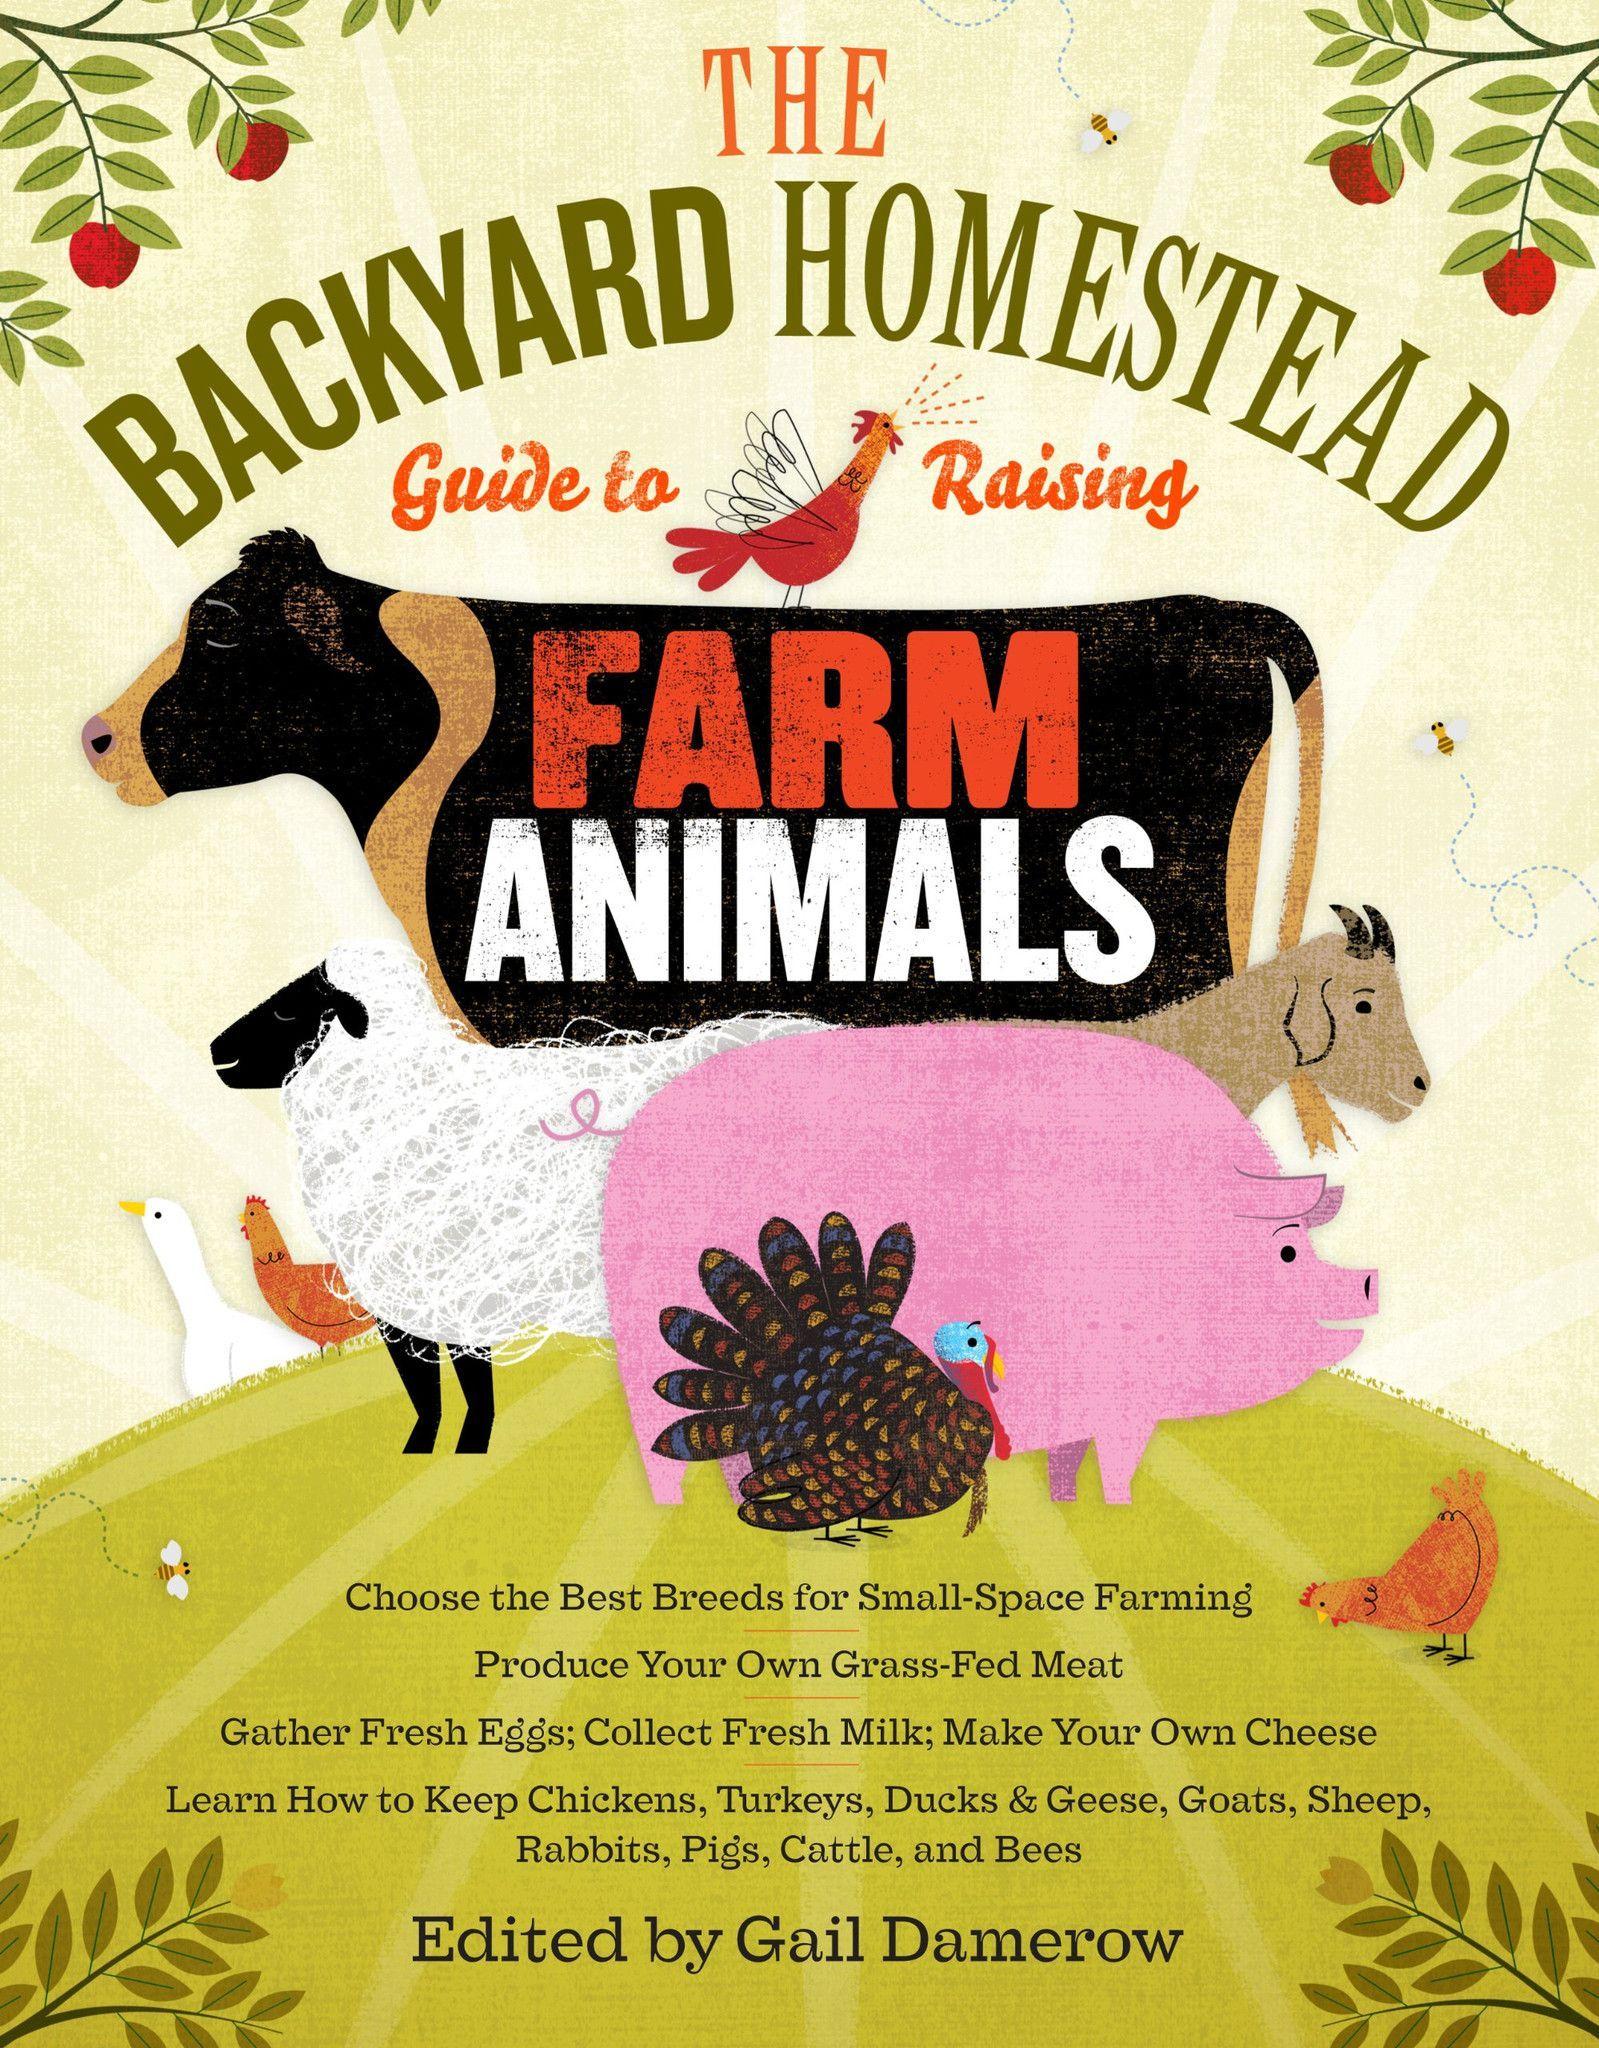 the backyard homestead guide to raising farm animals choose the